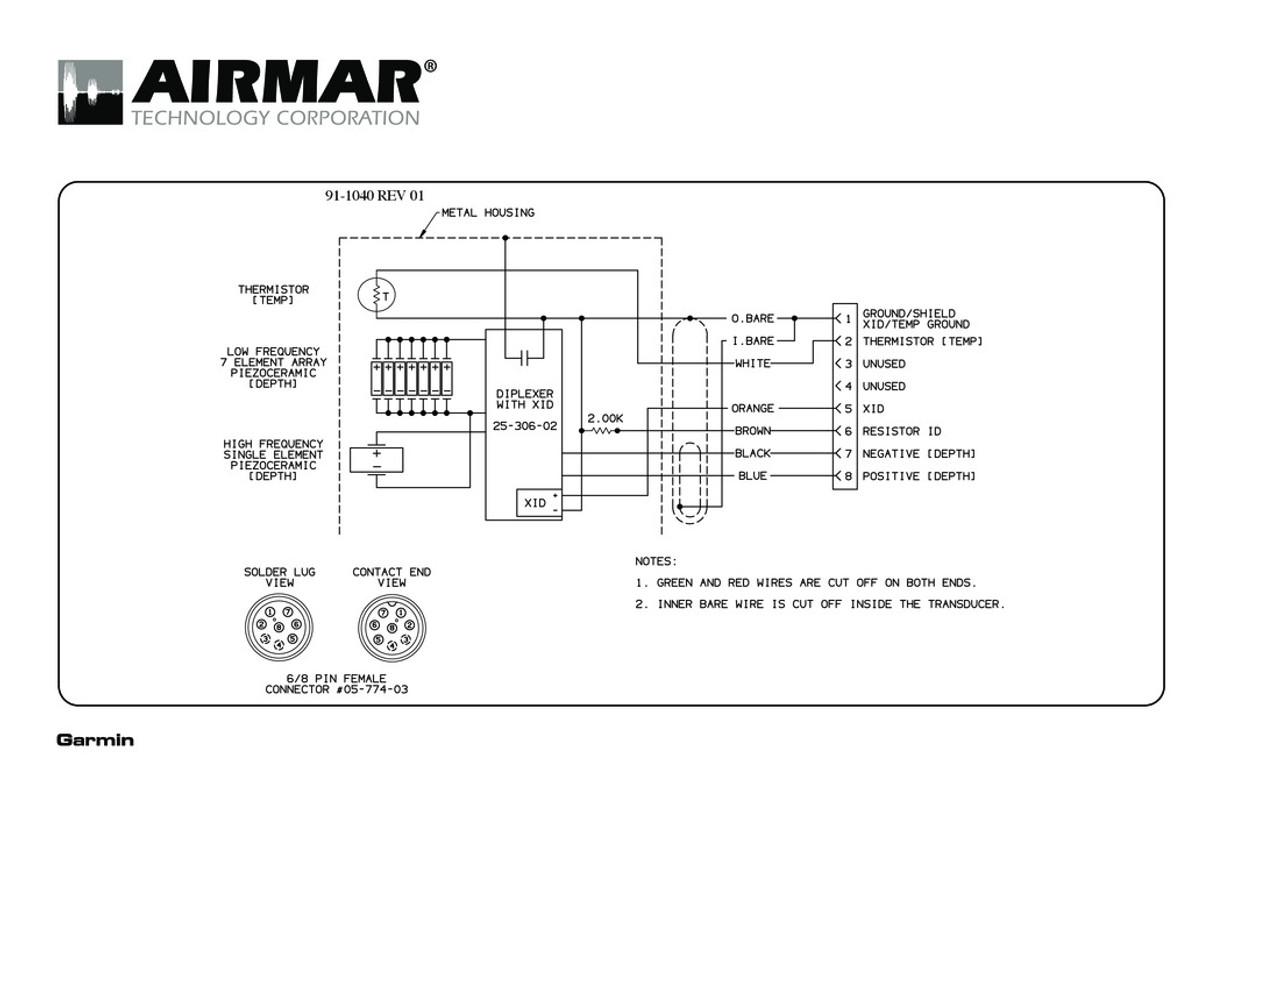 garmin 7 pin wiring diagram free wiring diagram for you u2022 rh evolvedlife store connector 8 pin relay wiring diagram 8 pin trailer connector wiring  [ 1100 x 850 Pixel ]